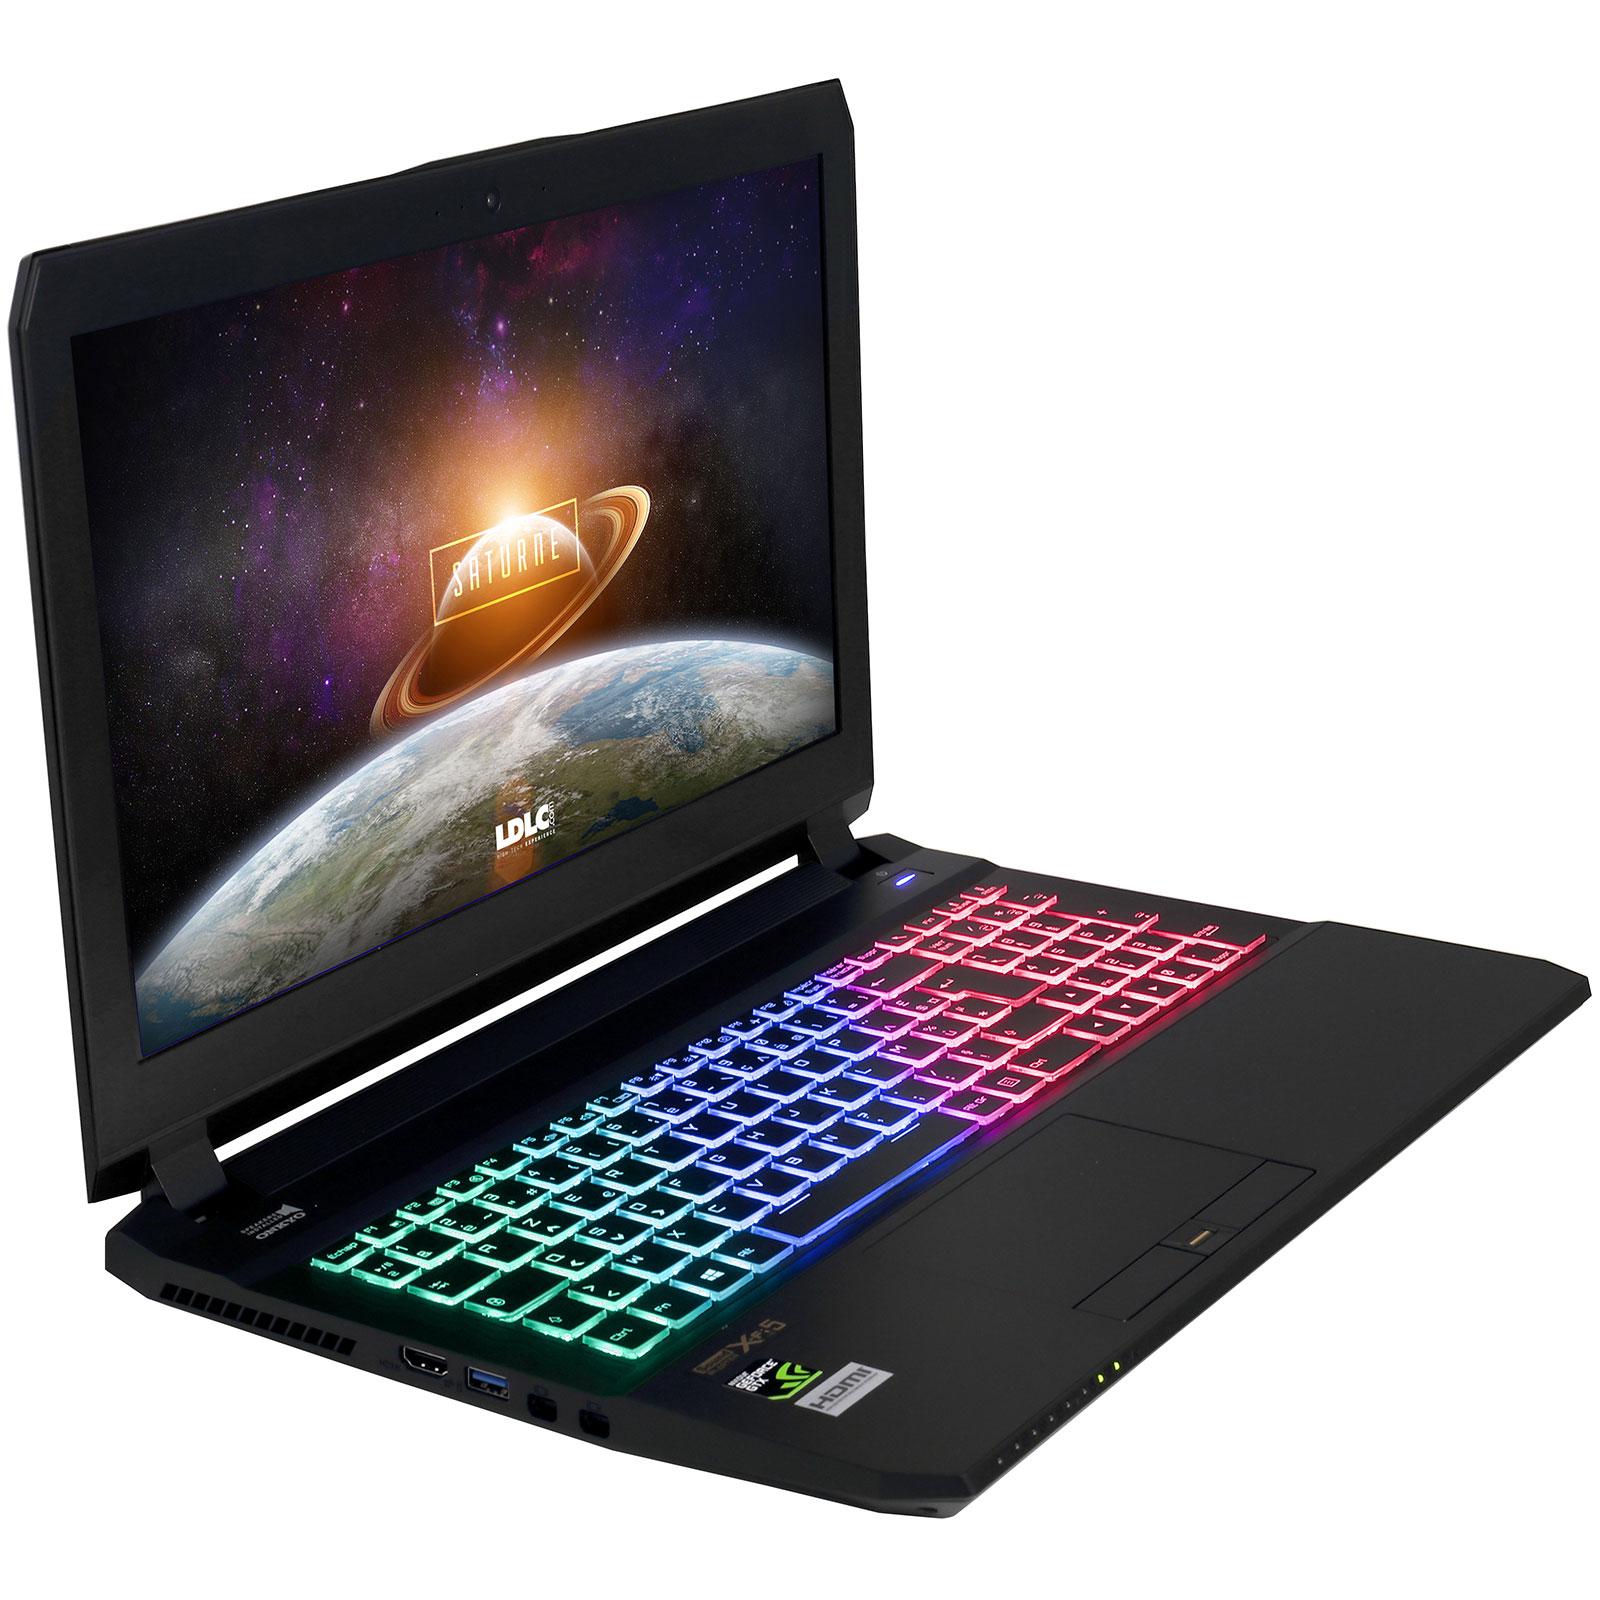 "PC portable LDLC Saturne TK71A-I7-16-H20S5 Intel Core i7-7700HQ 16 Go SSD 525 Go + HDD 2 To 15.6"" LED Full HD NVIDIA GeForce GTX 1070 8 Go Wi-Fi AC/Bluetooth Webcam (sans OS)"